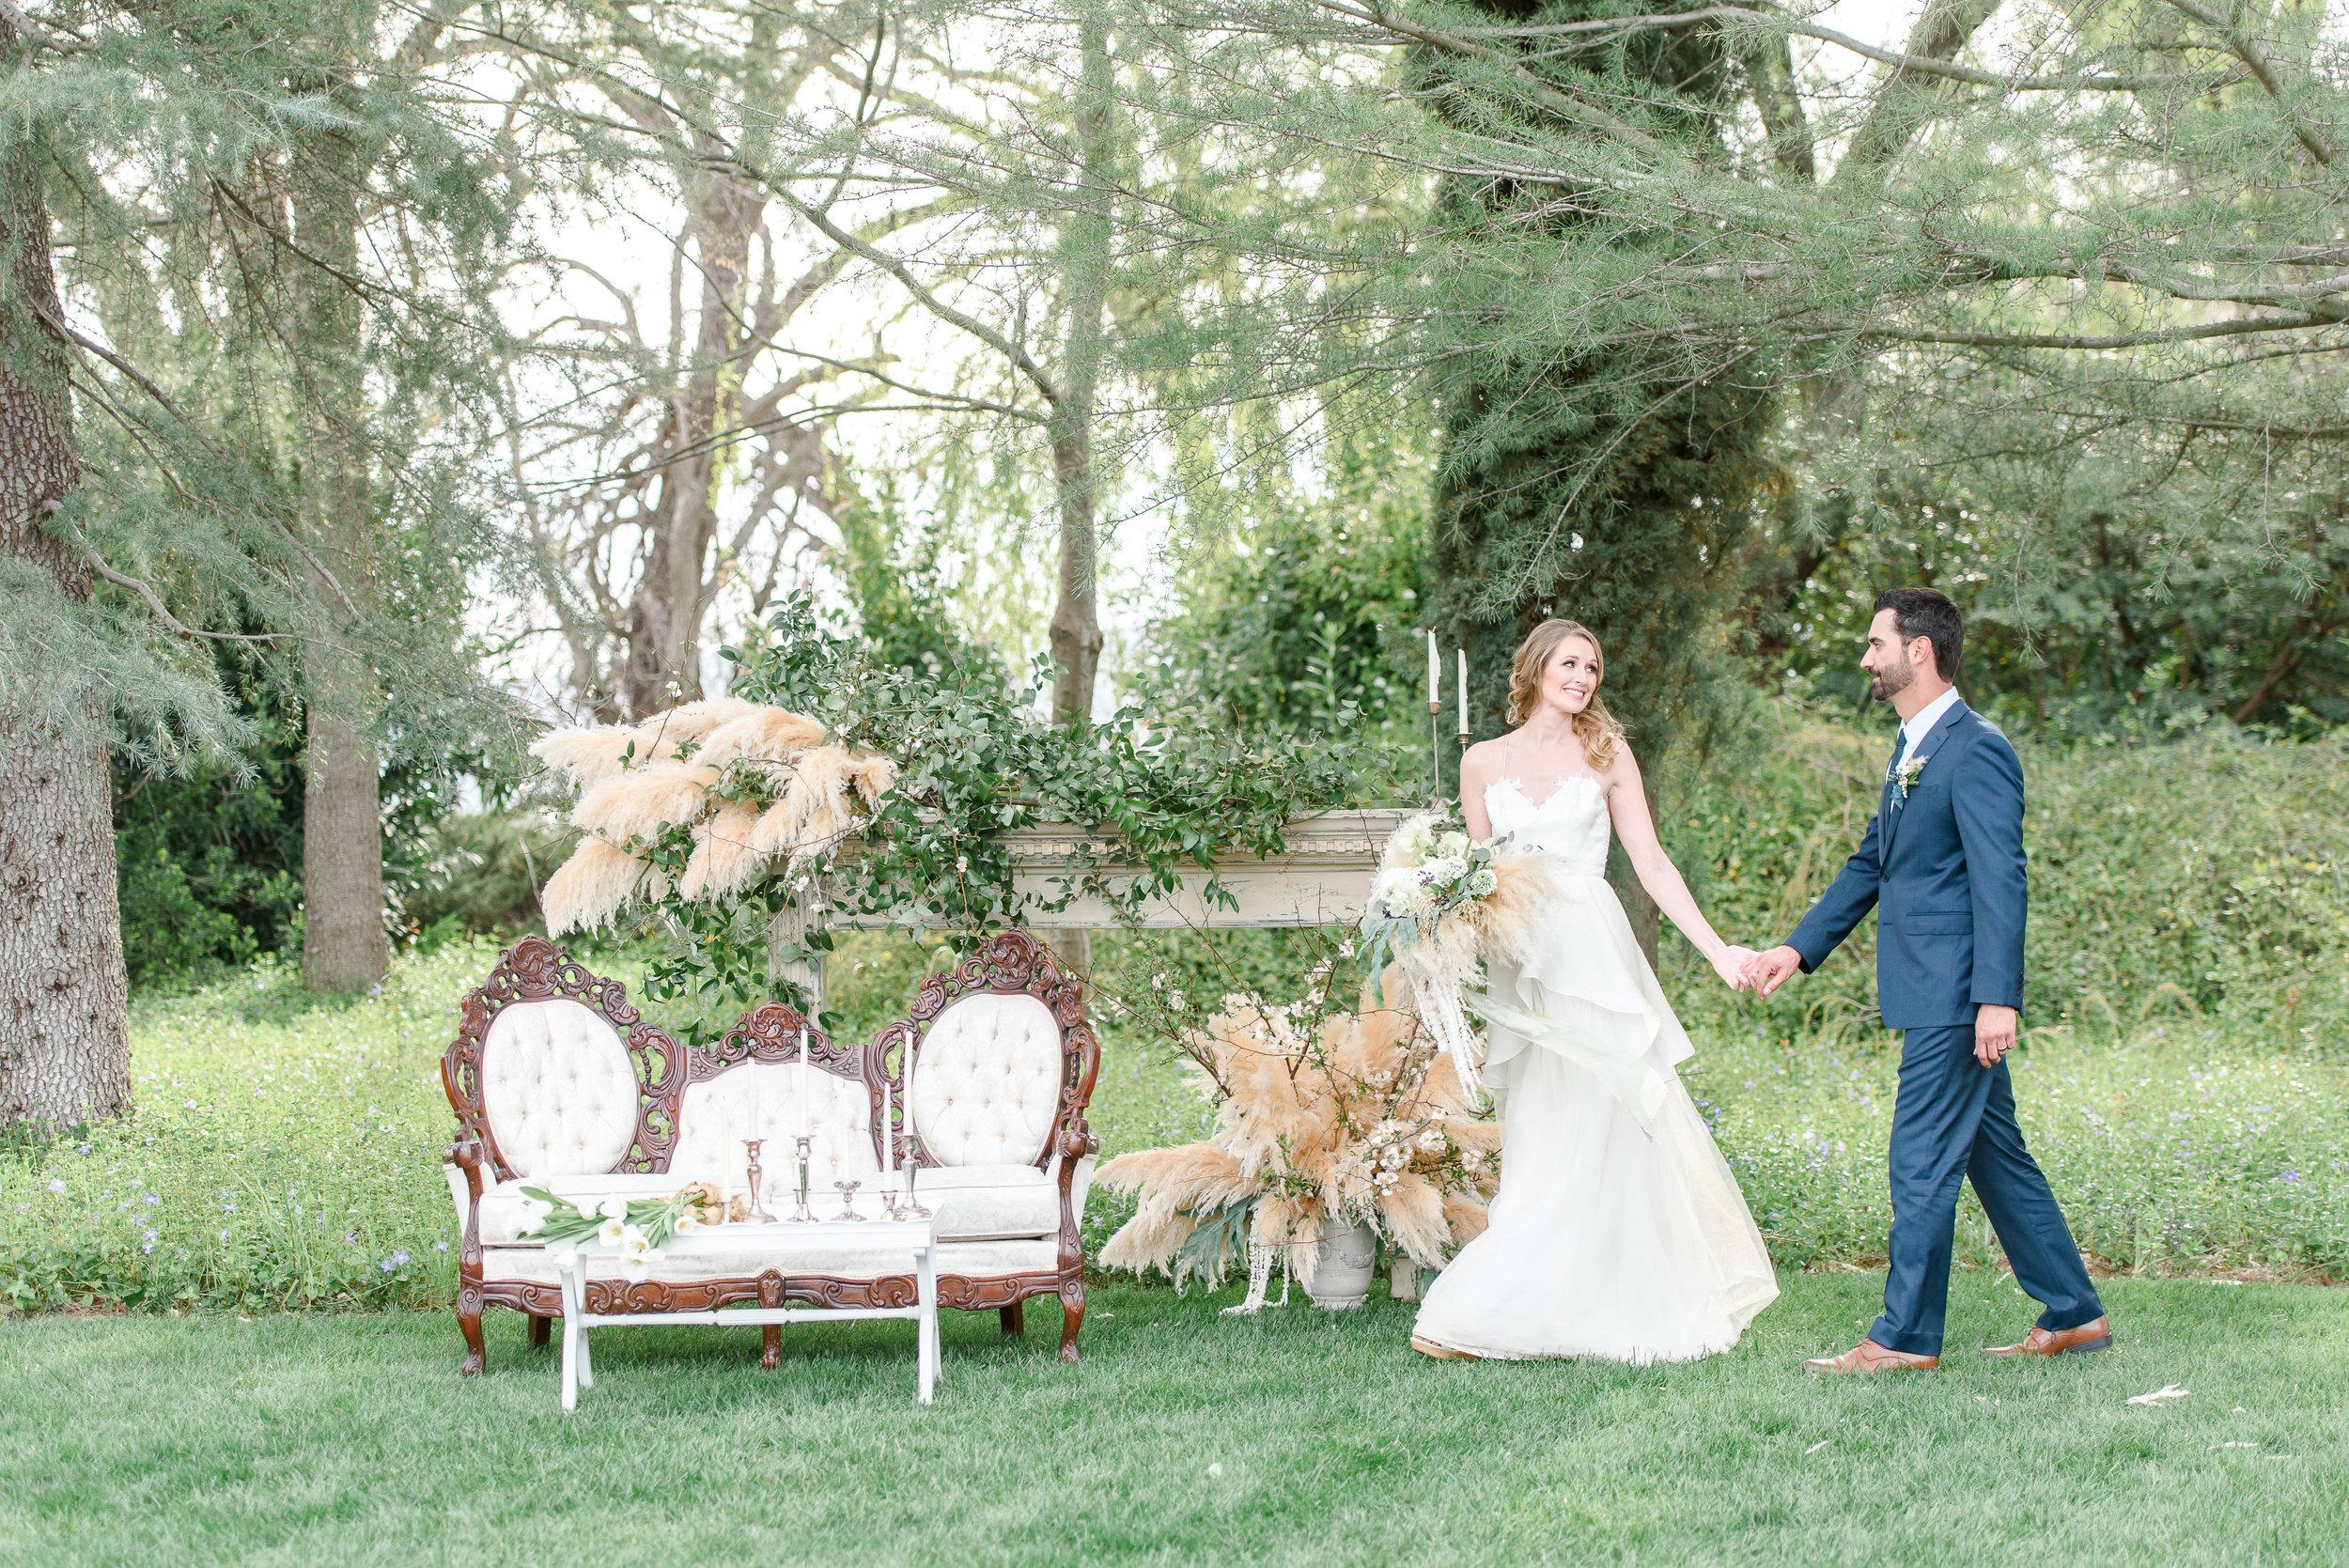 Garden Wedding Inspiration | Wedding Lounge Seating